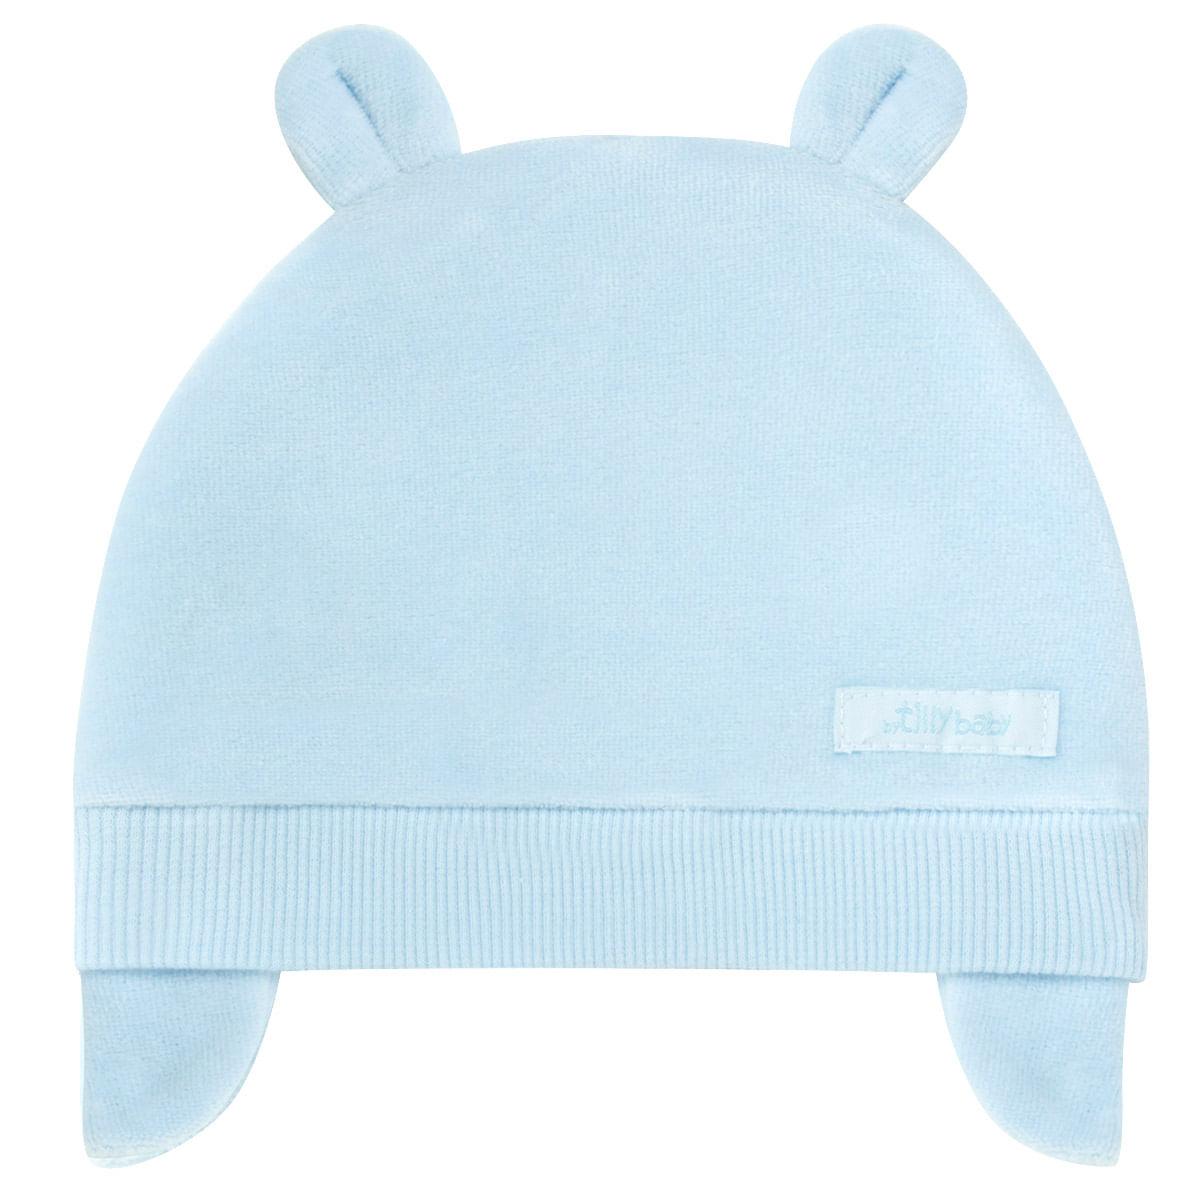 08ade63c7df6e Touca Orelhinha para bebe em plush Azul - Tilly Baby no Bebefacil ...